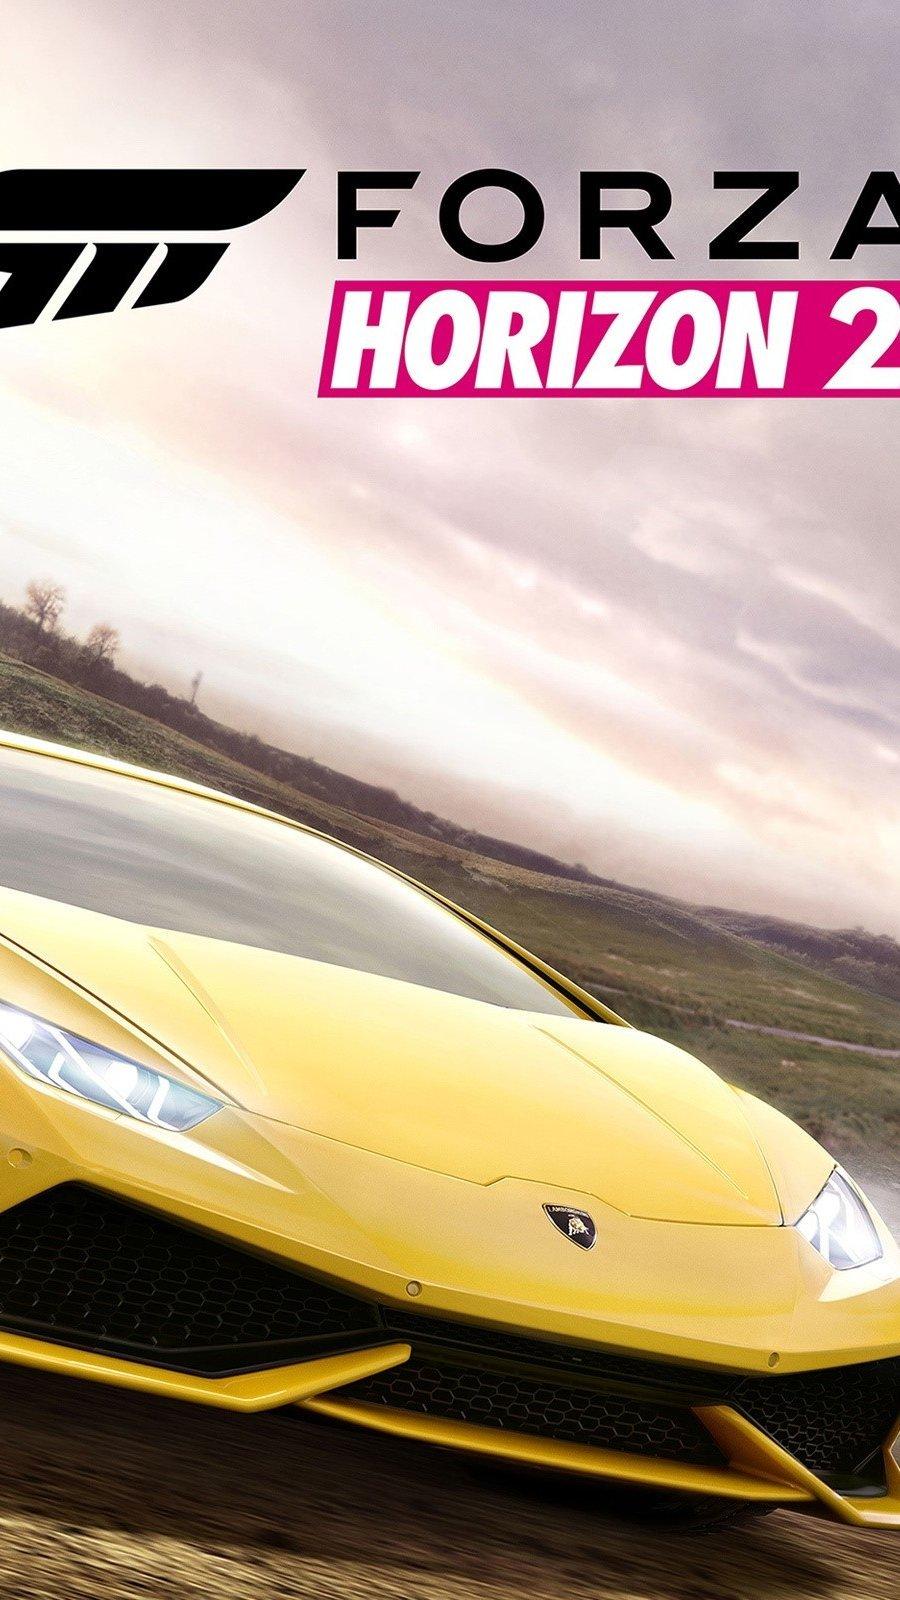 Wallpaper Forza horizon 2 Vertical